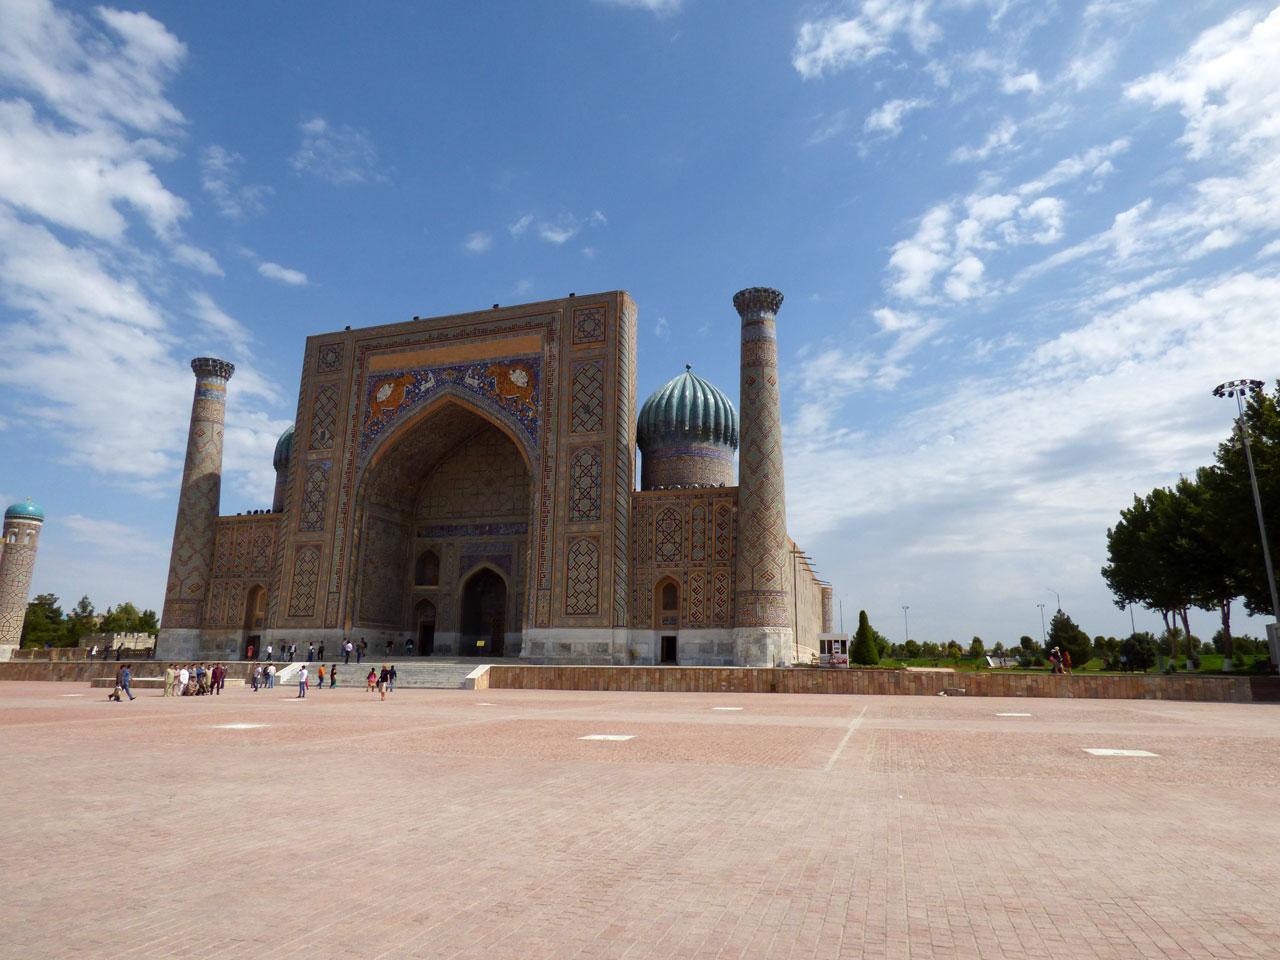 Sher Dor madrassa, Samarkand